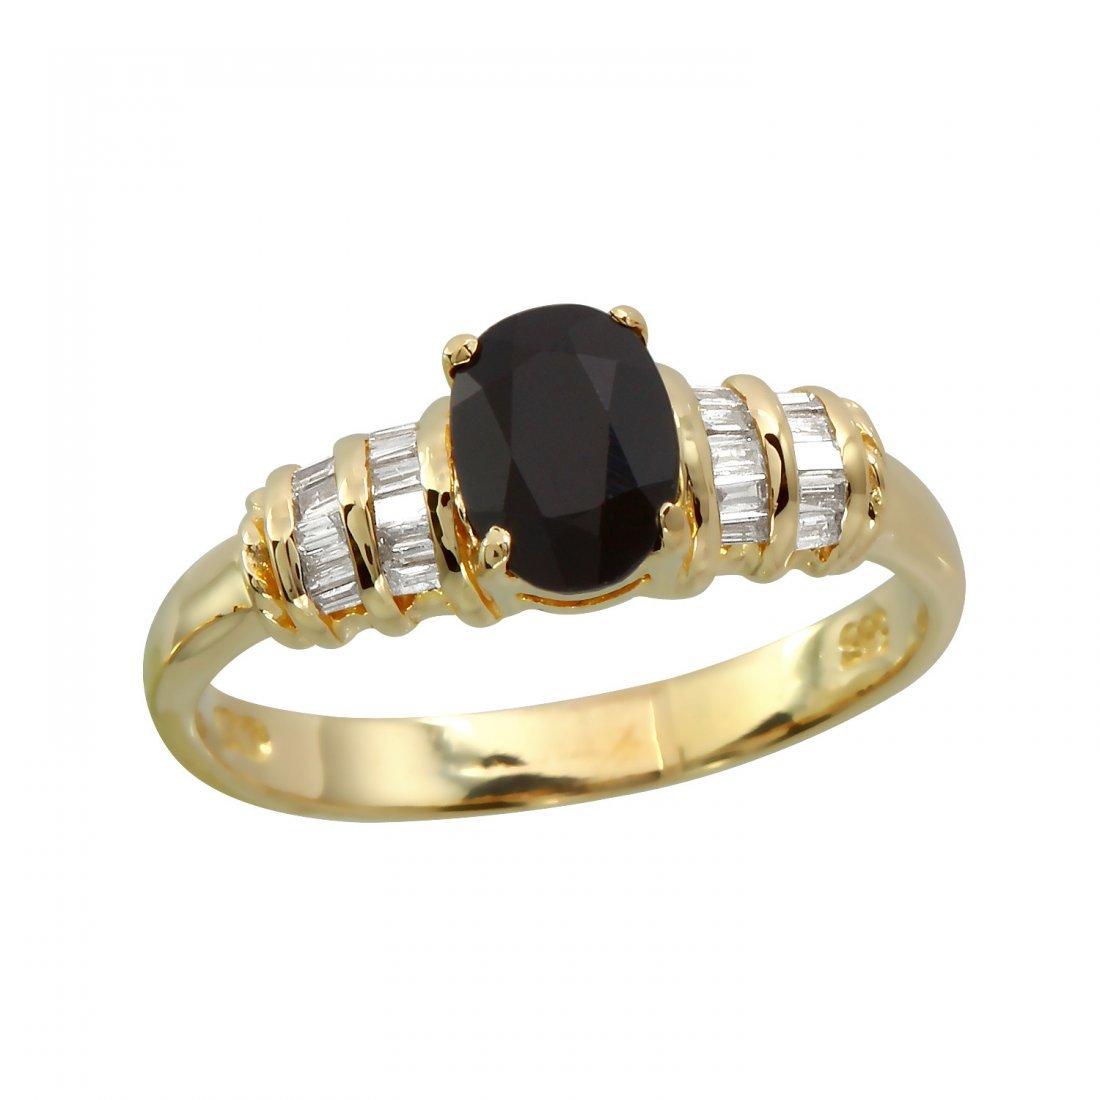 Ladies 1.12 CTW Sapphire And Diamond 14K Yellow Gold